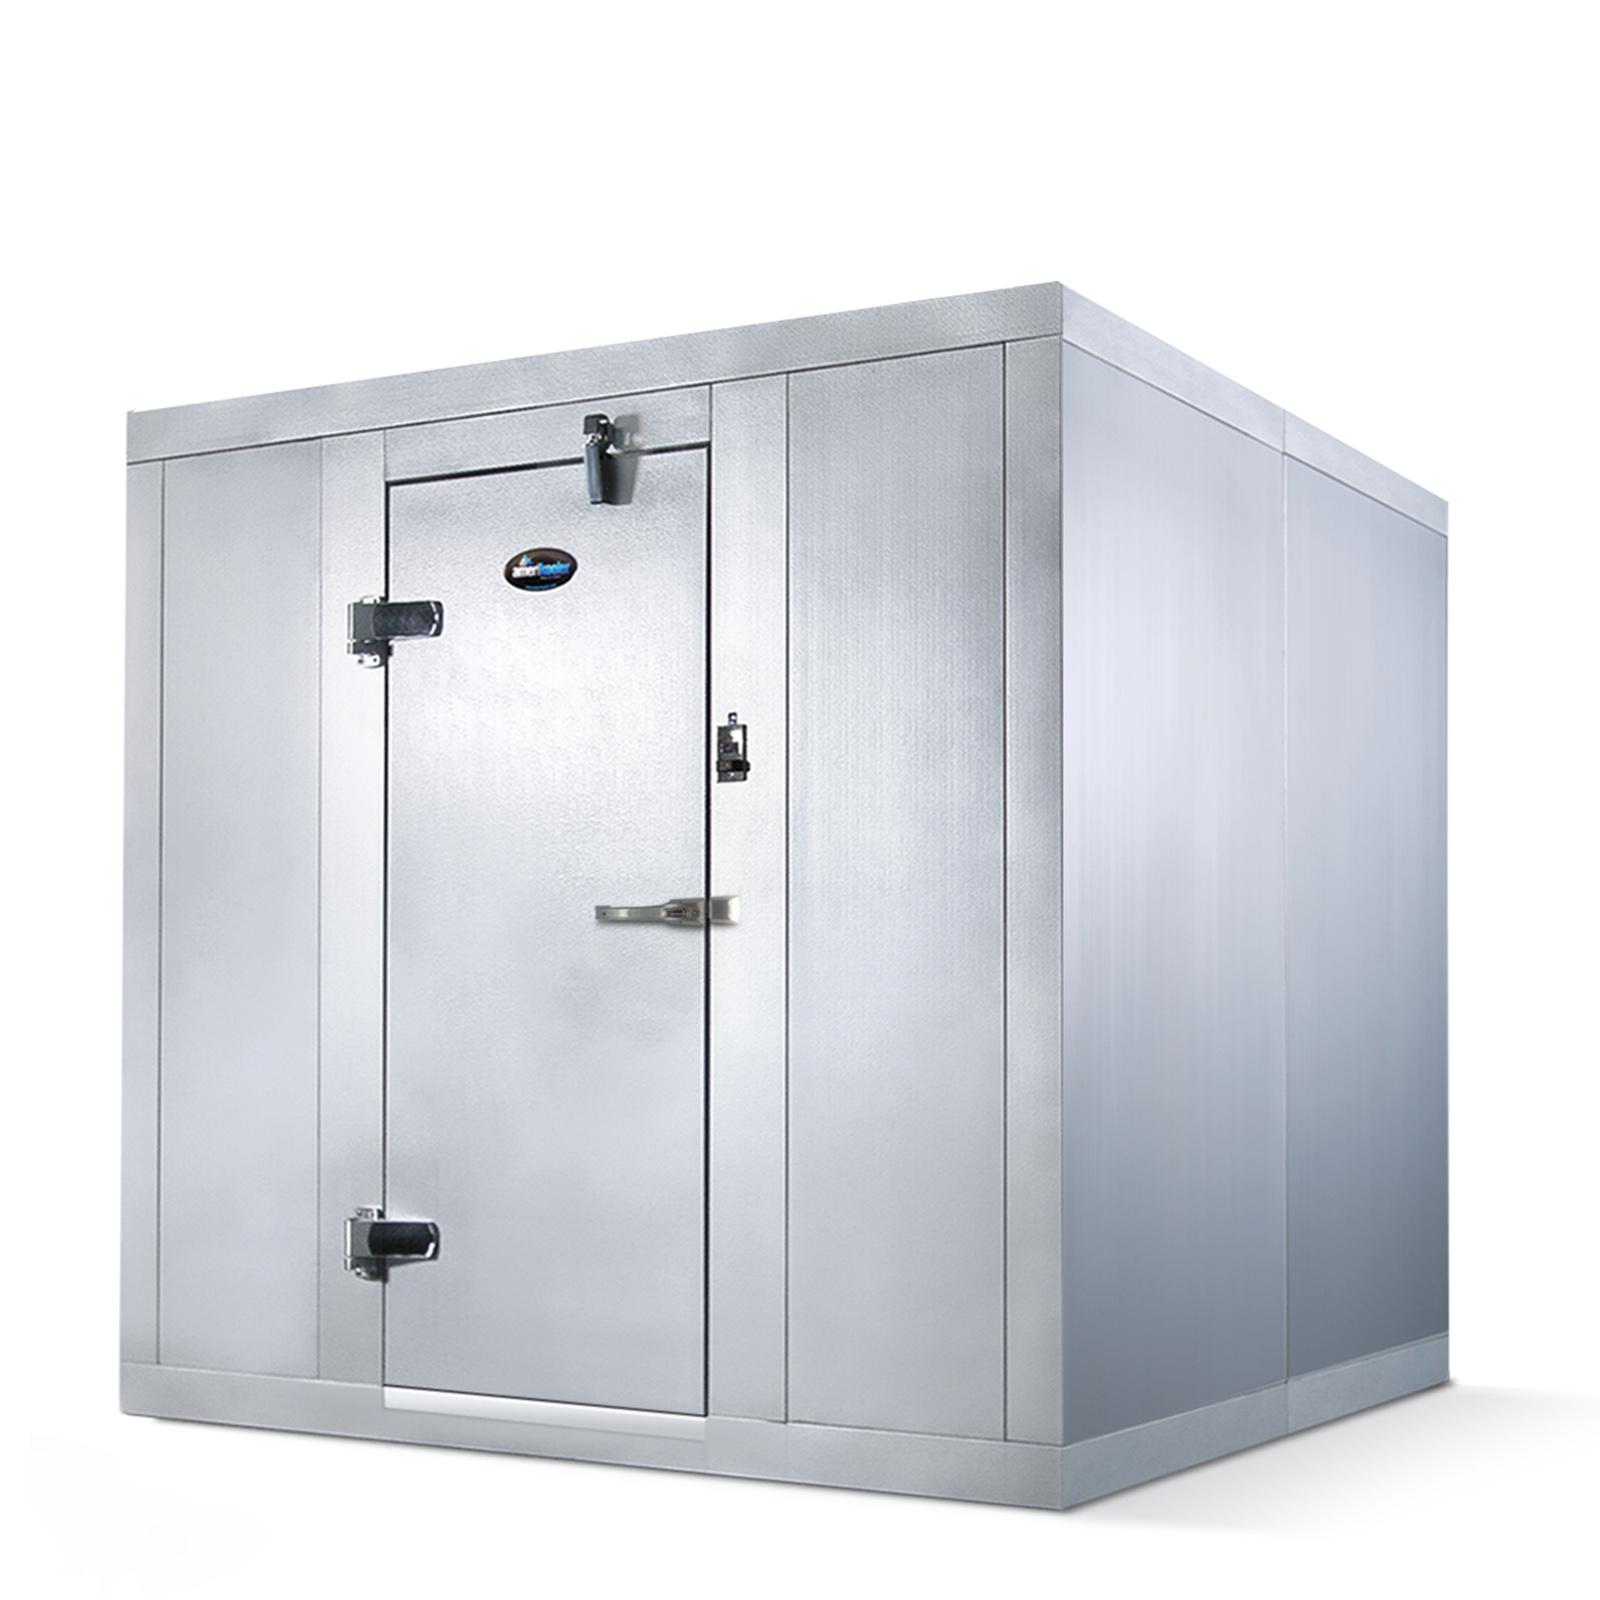 AmeriKooler DF081077**FBRM walk in freezer, modular, remote